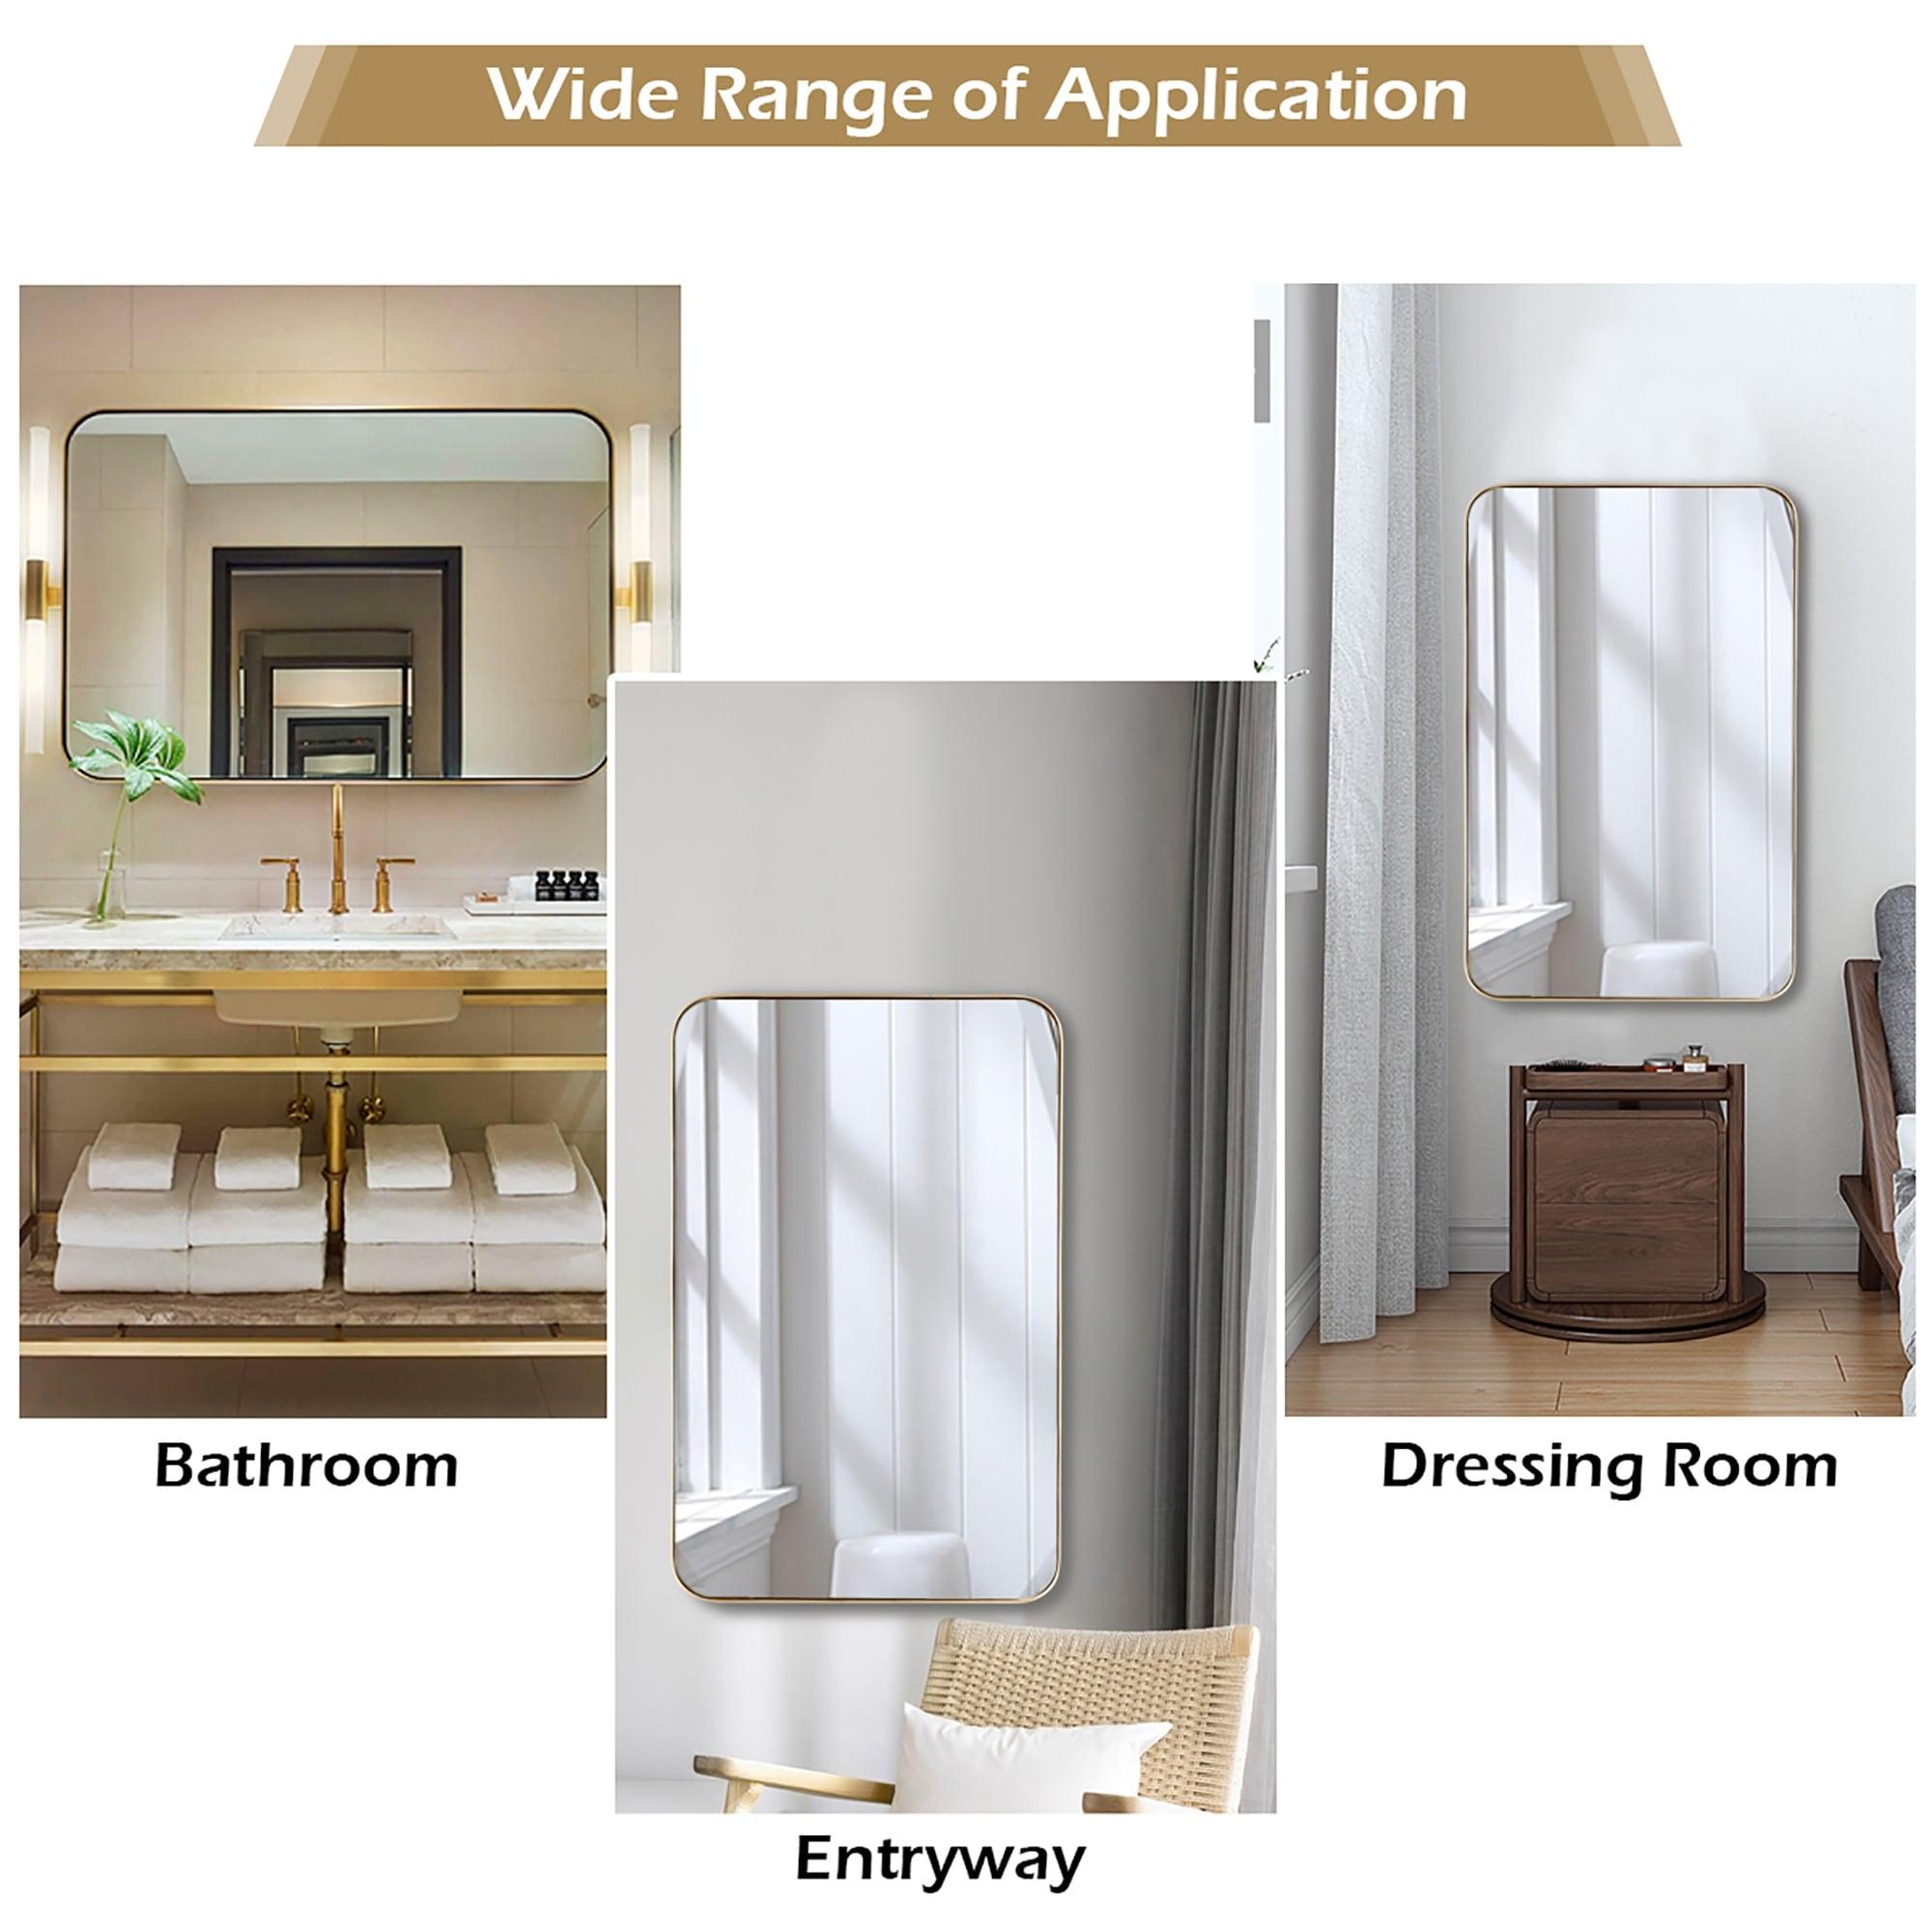 20 X 32 Inch Bathroom Wall Mirror Rectangular Wall Hanging Mirror On Sale Overstock 31937480